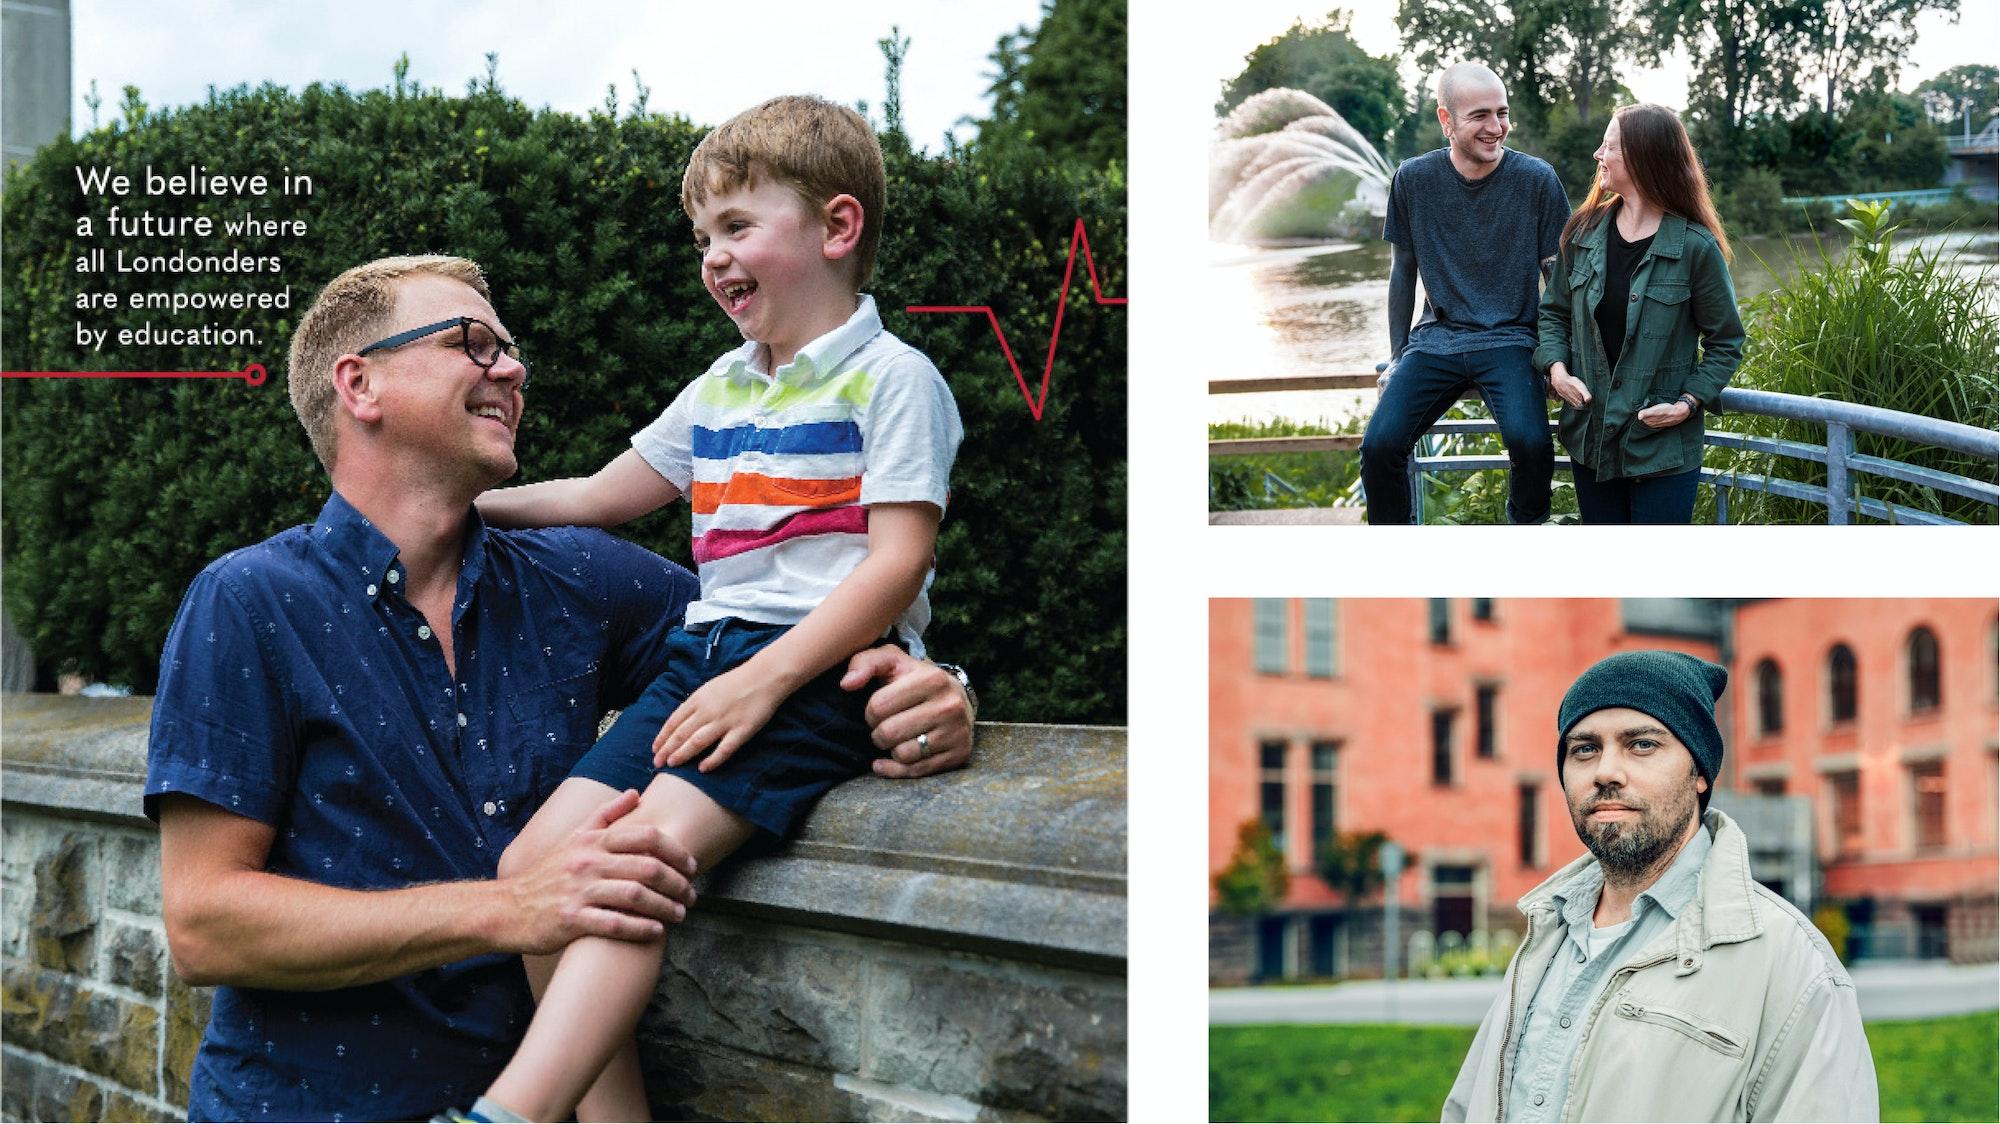 Three photographs of Londoners around the city